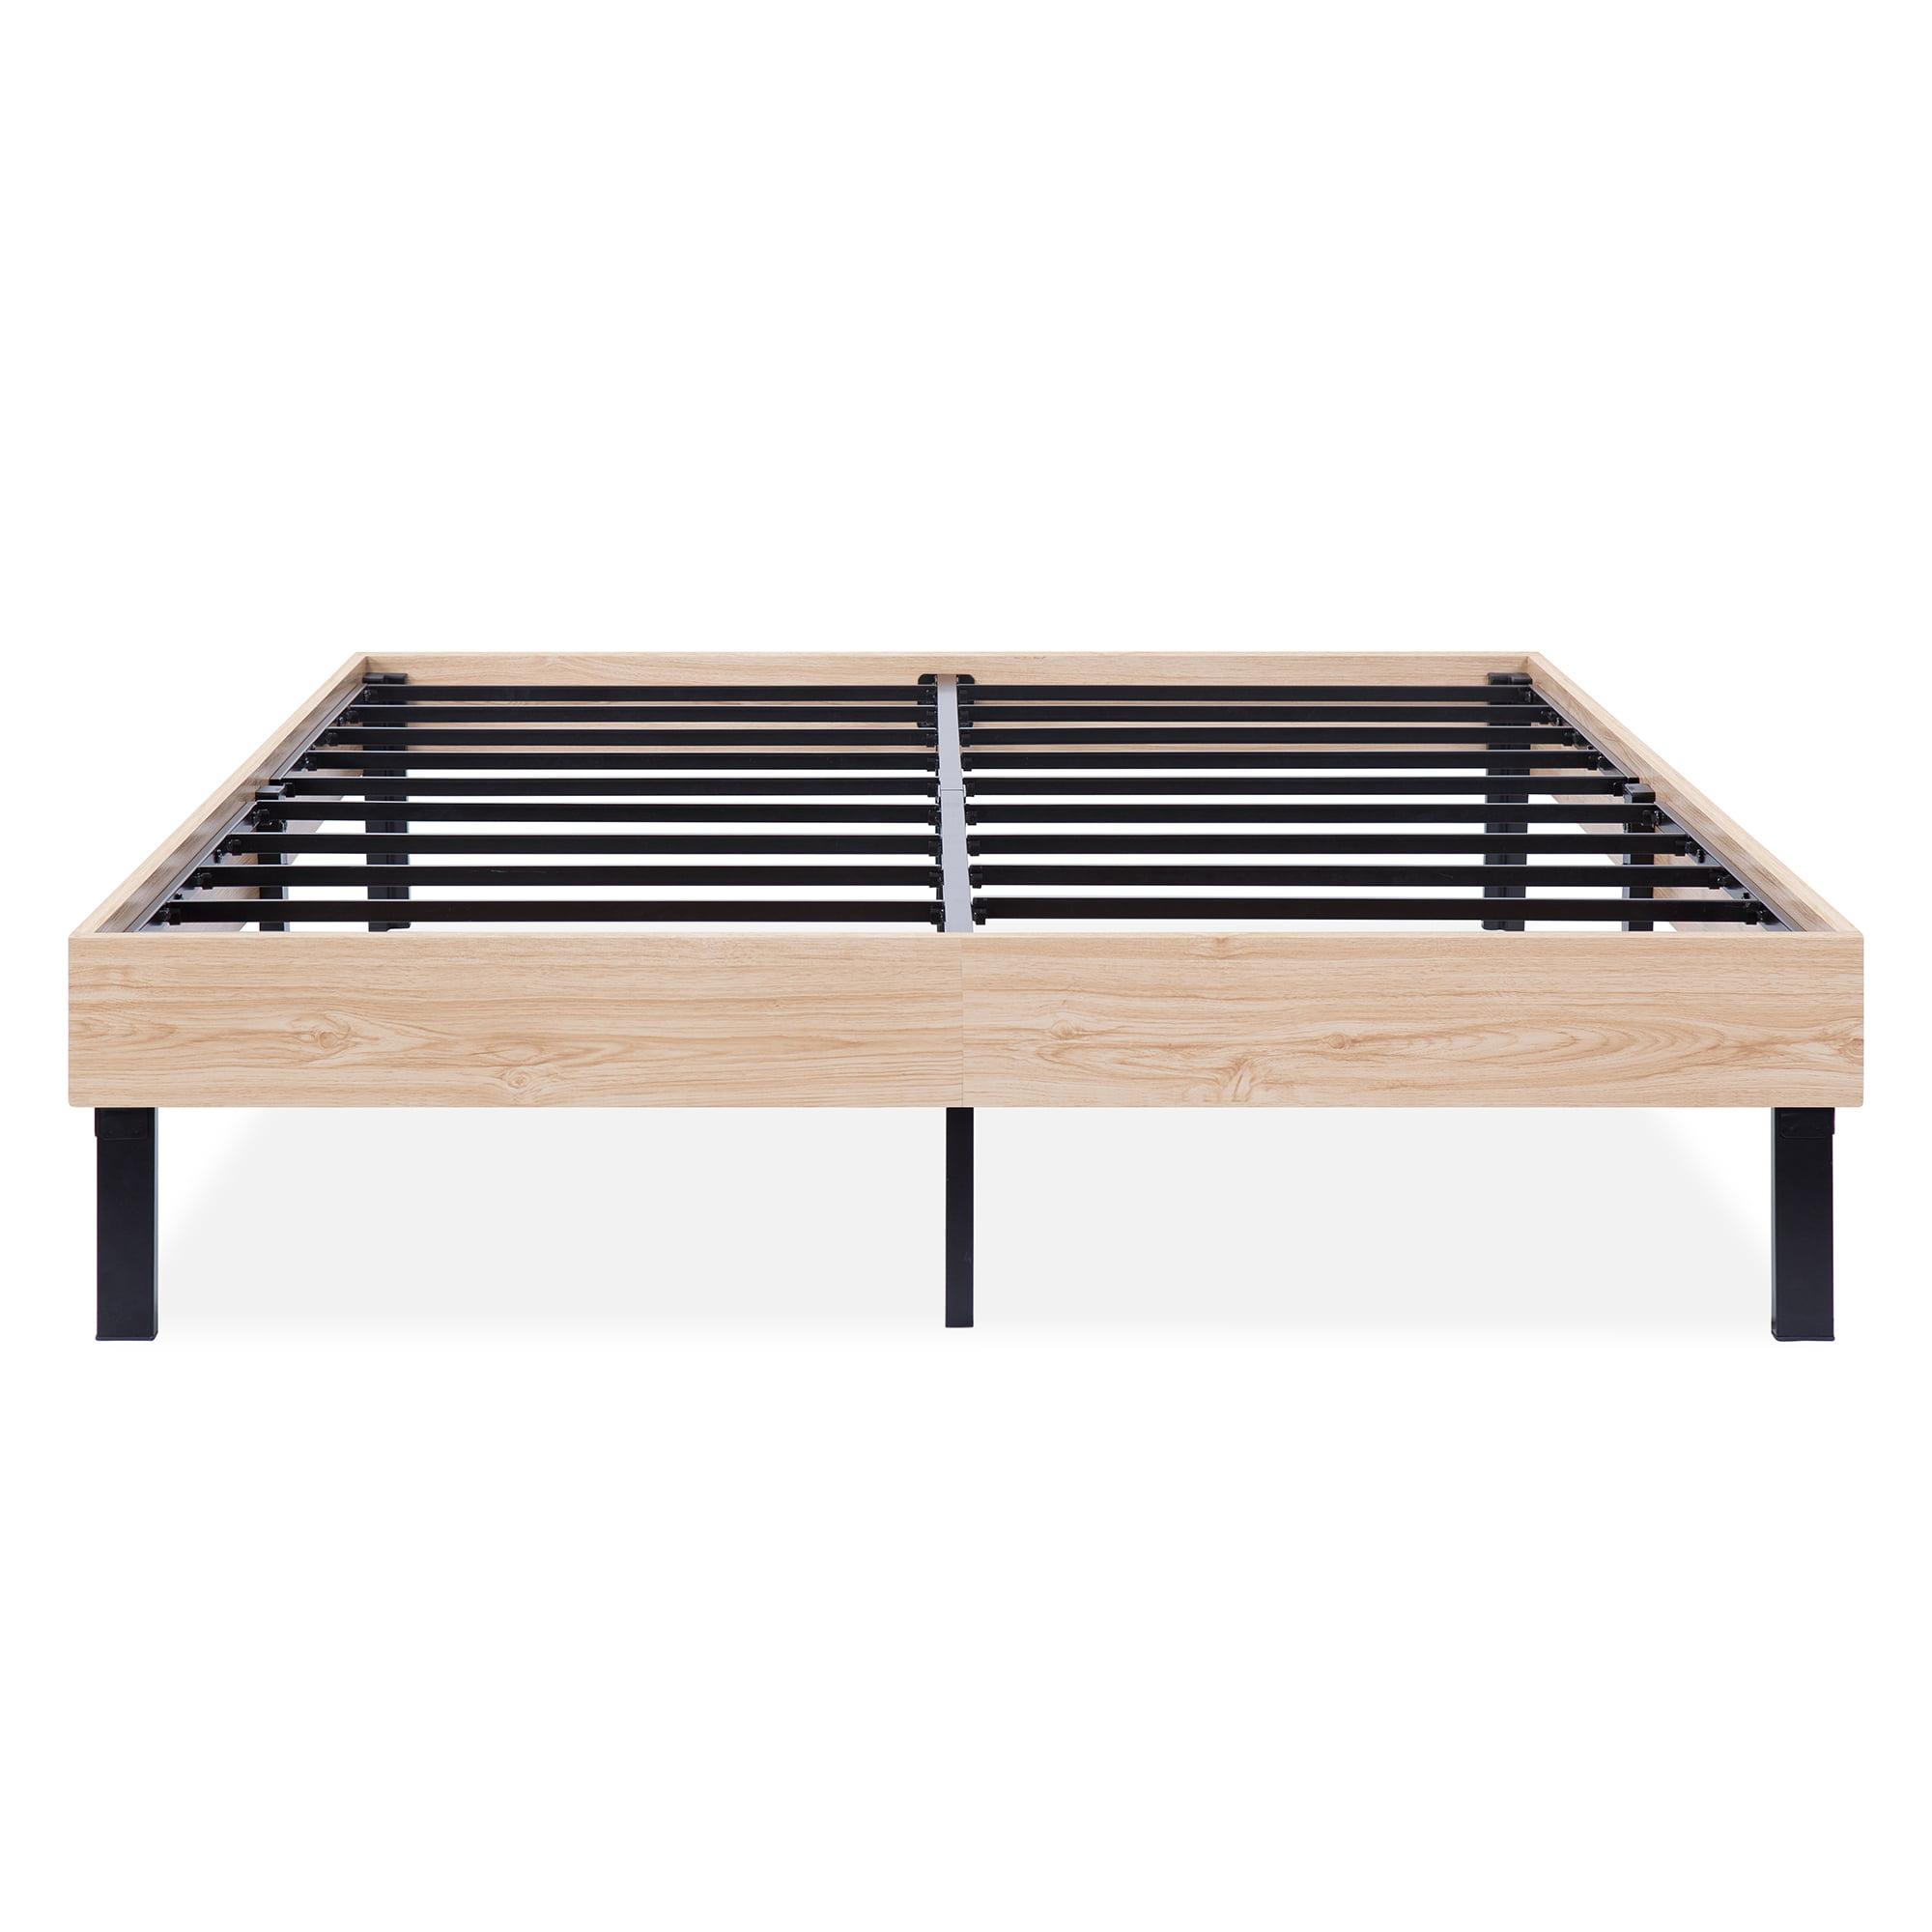 GranRest 14 Inch Classic Natural Wood Finished Platform Bed Frame   Dura Steel Slat Support, Stylish Natural by Grantec Co., Ltd